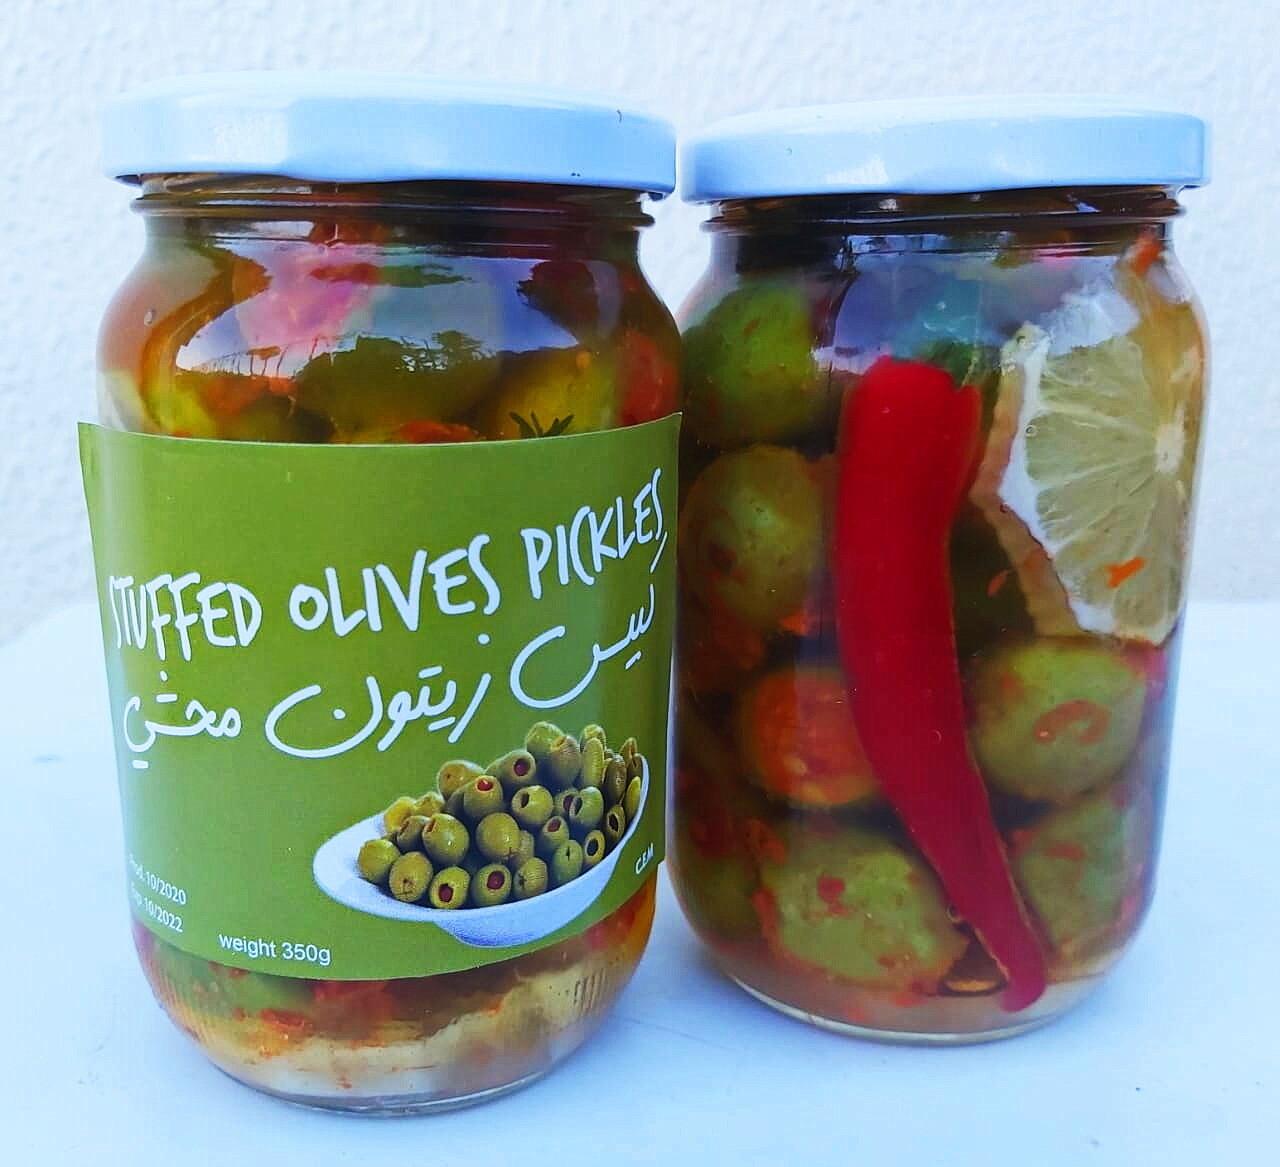 Stuffed Olives زيتون محشي (Jar) - Les Reserves du Grenier